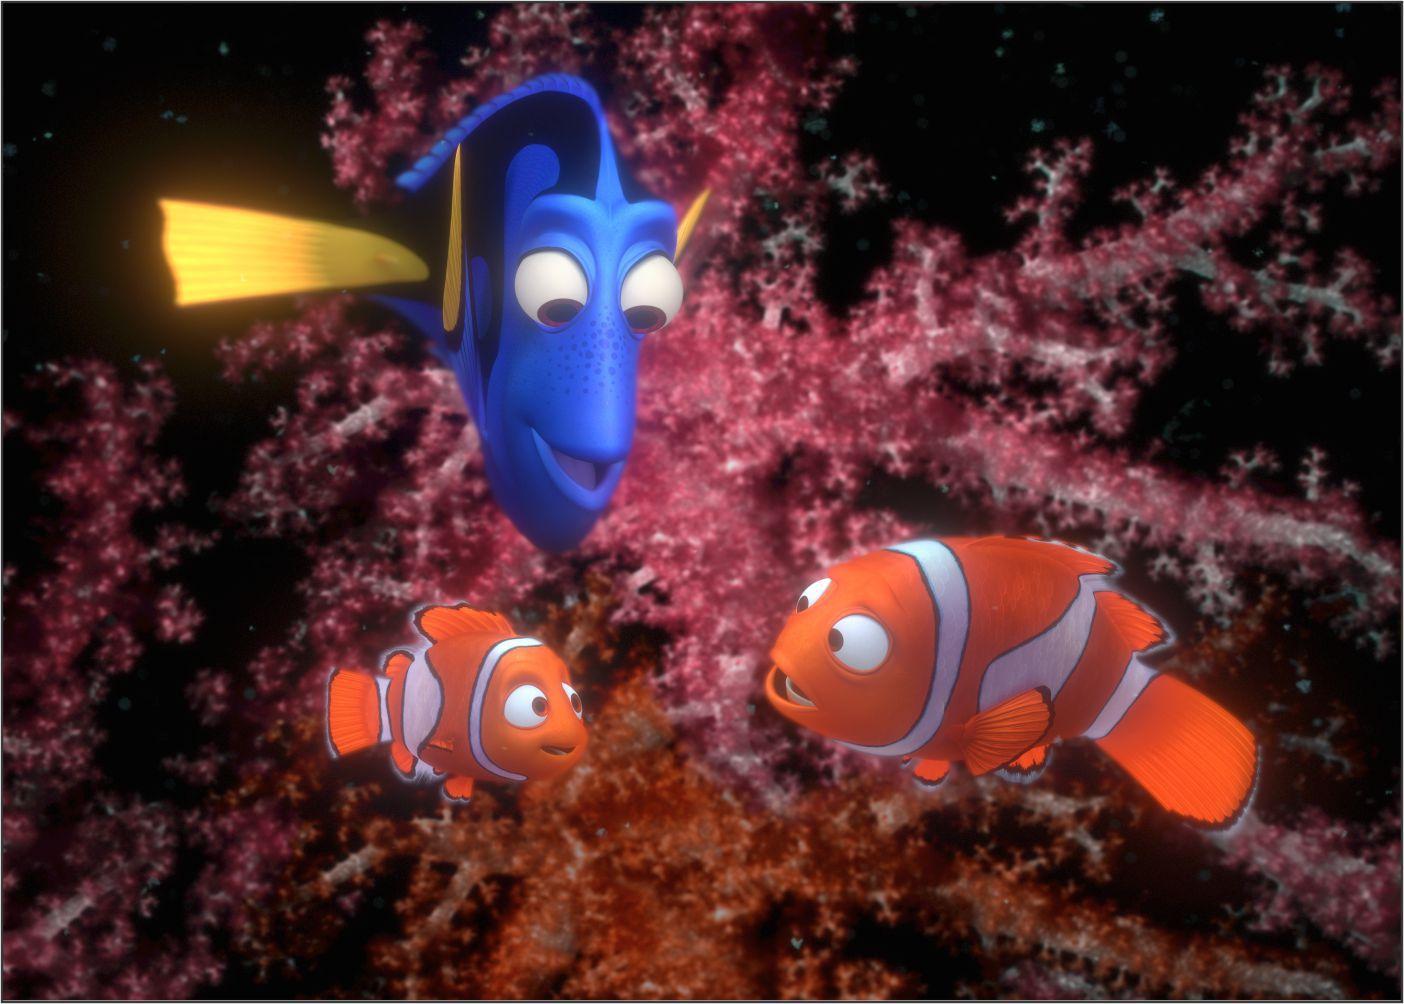 Papel de Parede 3D Nemo 0008 - Adesivos de Parede  - Paredes Decoradas